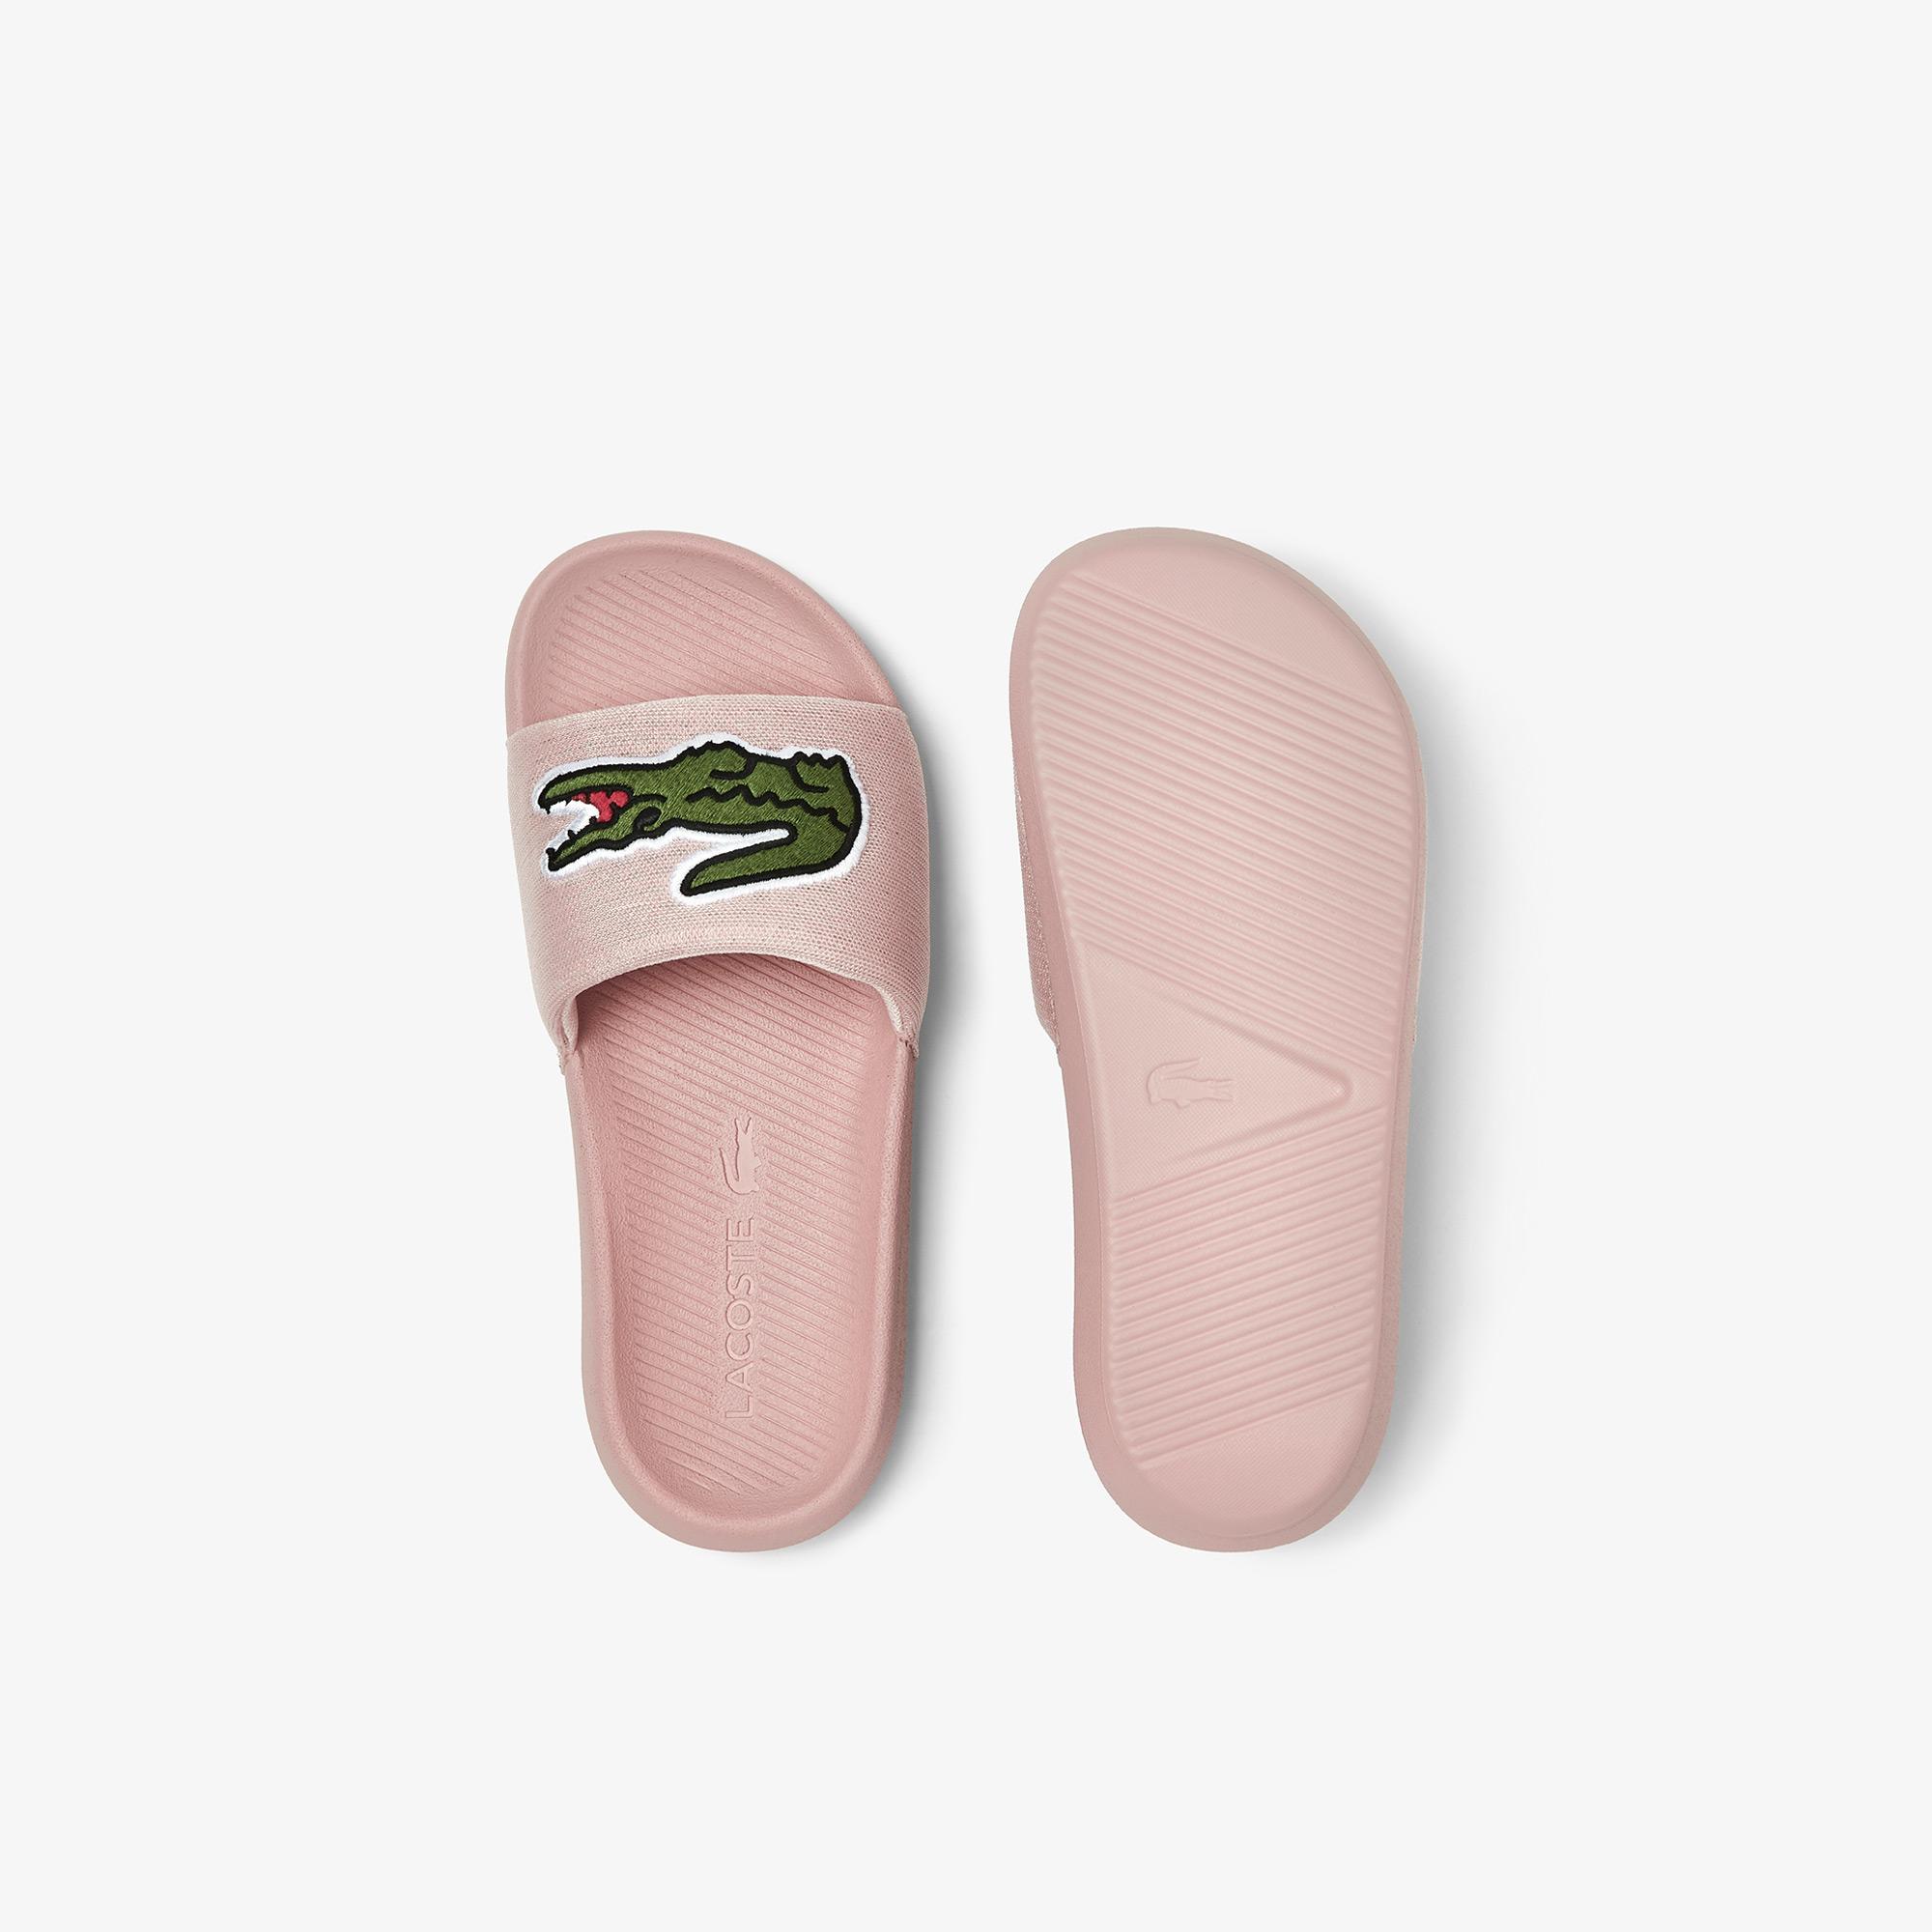 Lacoste Croco Slide 0921 1 Cfa Kadın Pembe - Yeşil Terlik